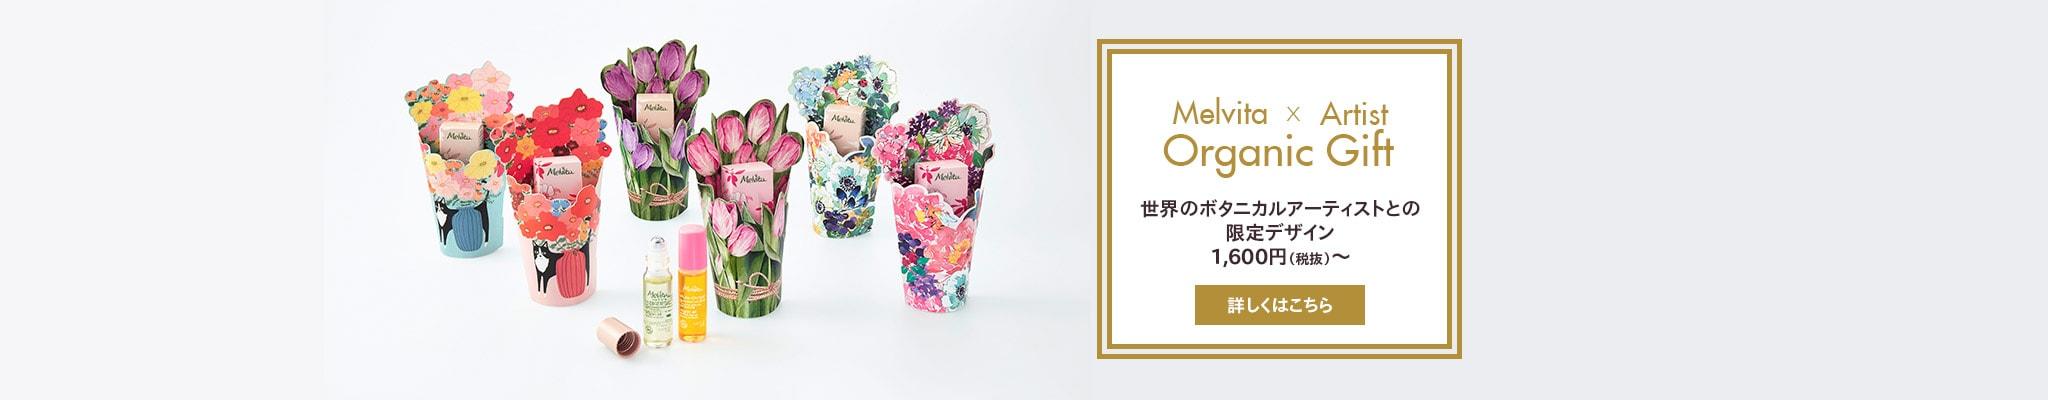 Melvita x Artist Collaboration Gift